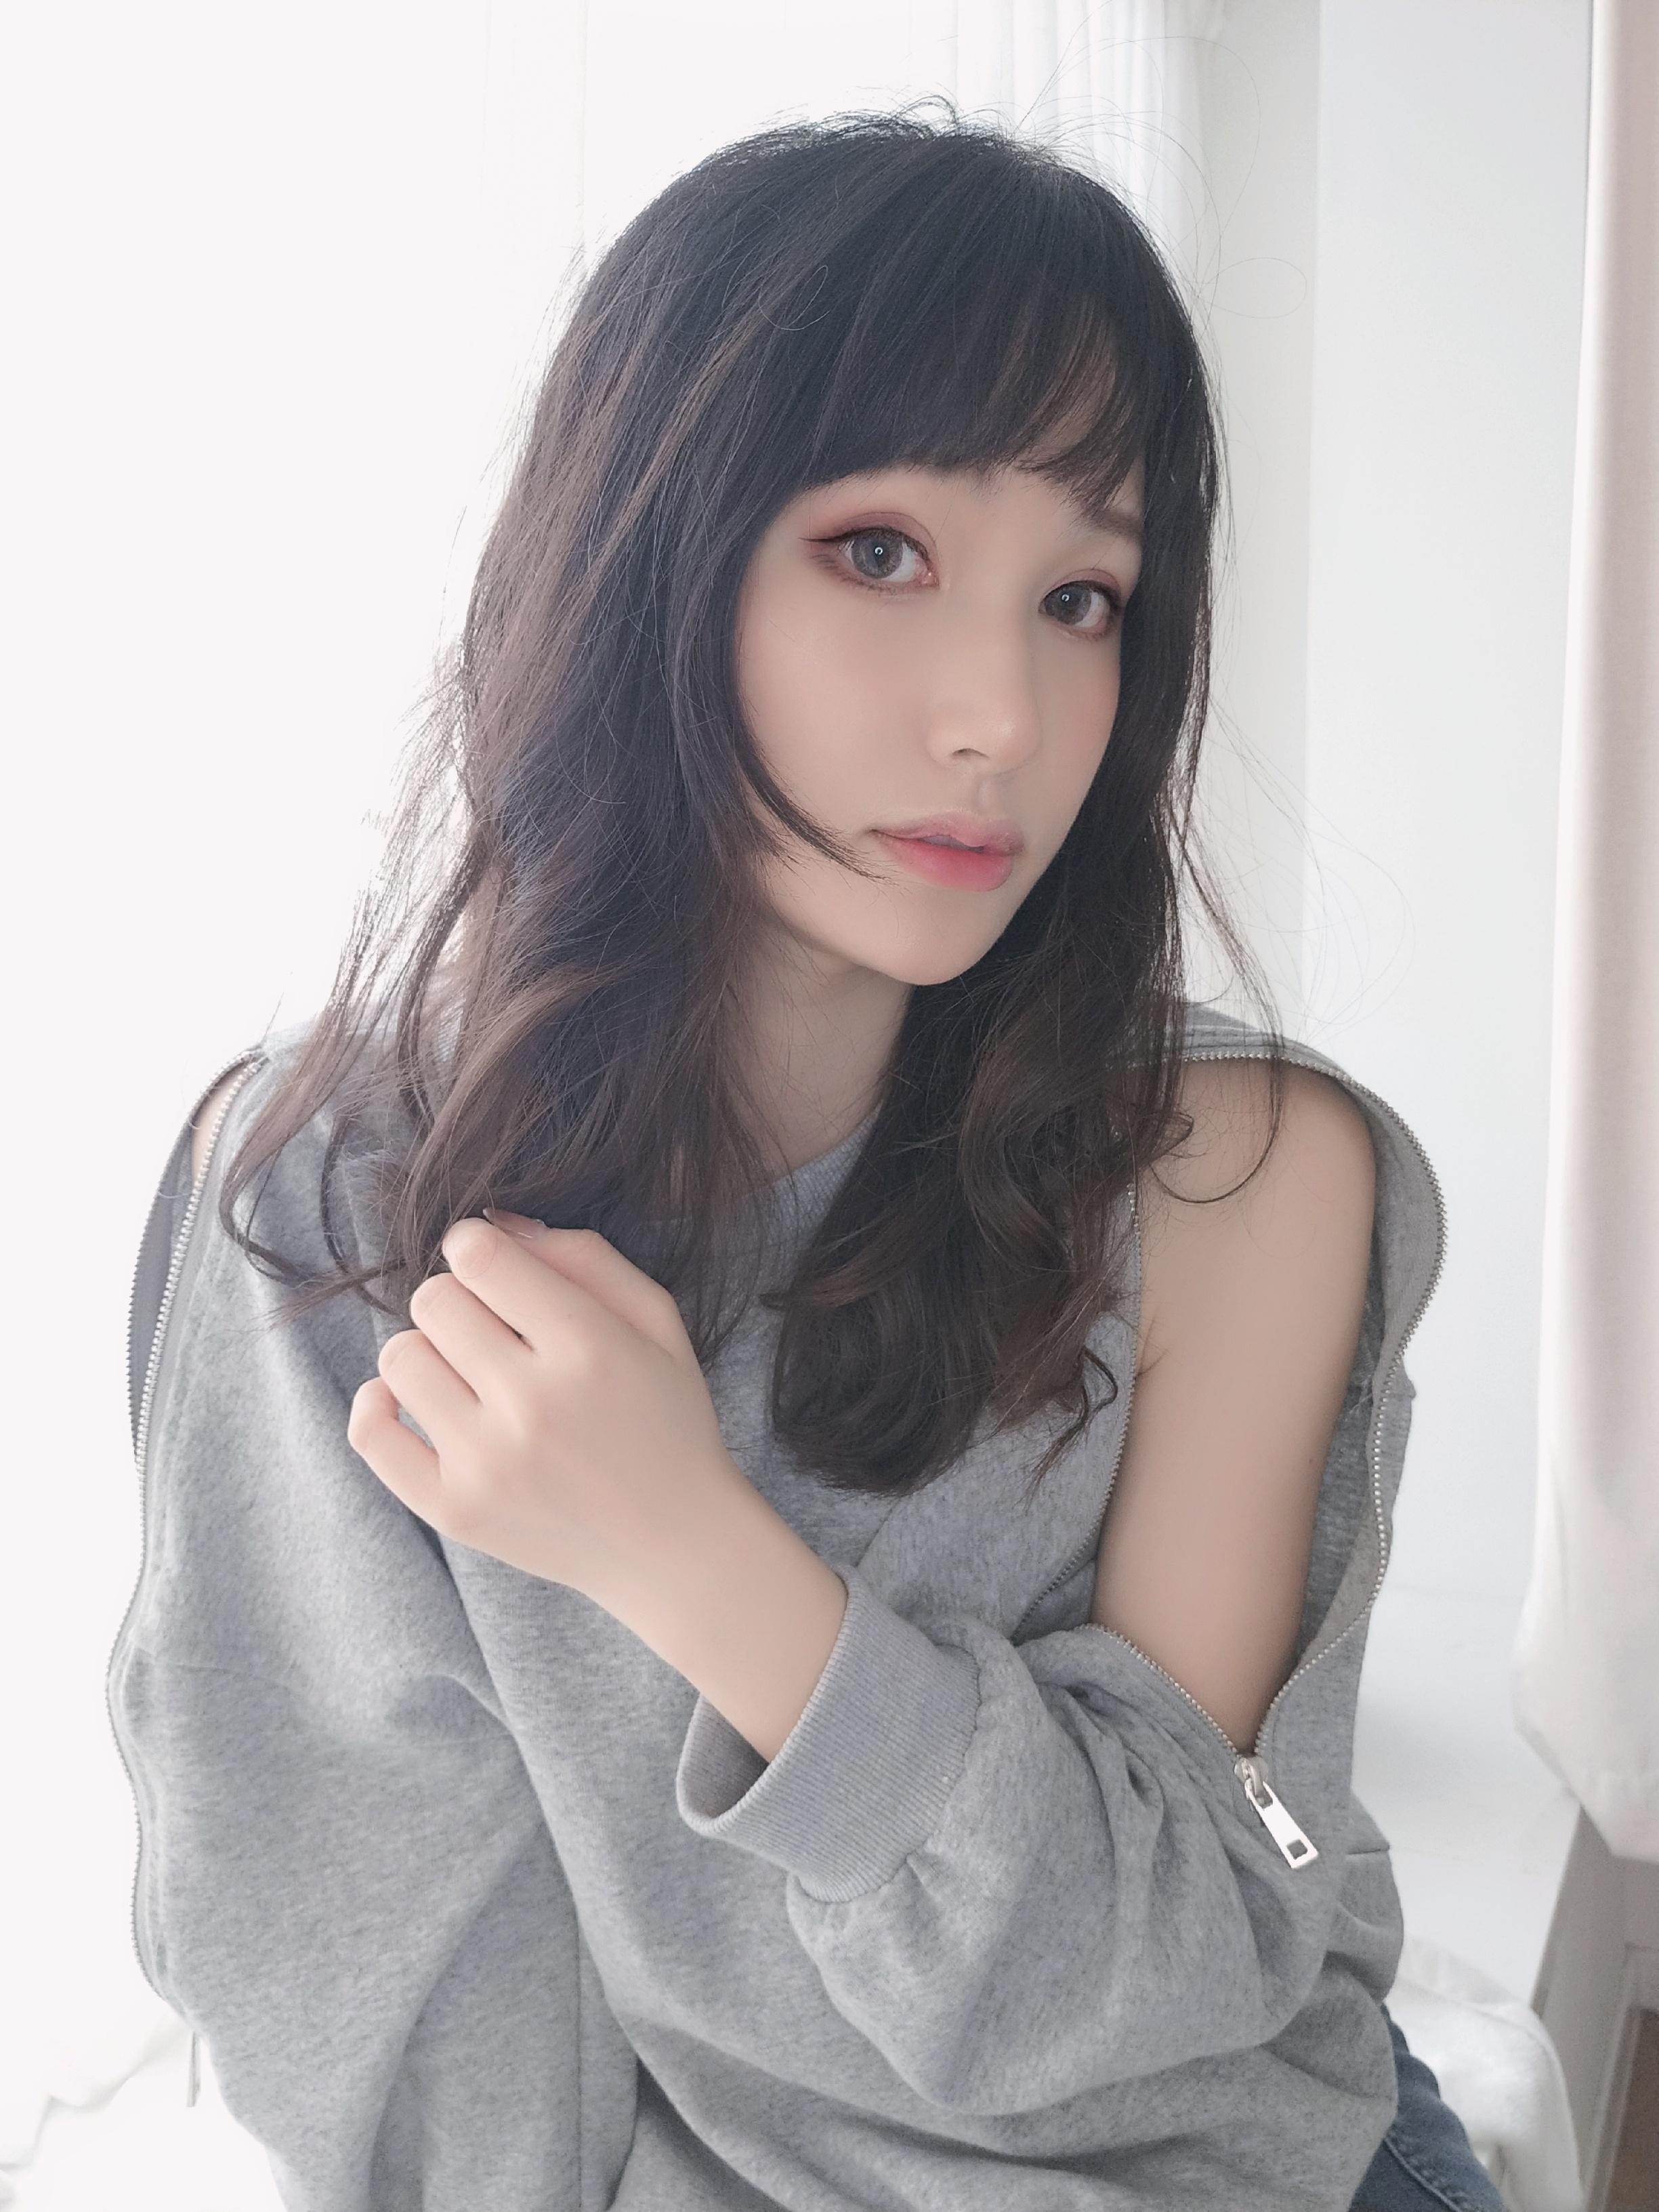 宅男咪zhainanmi.net (10)